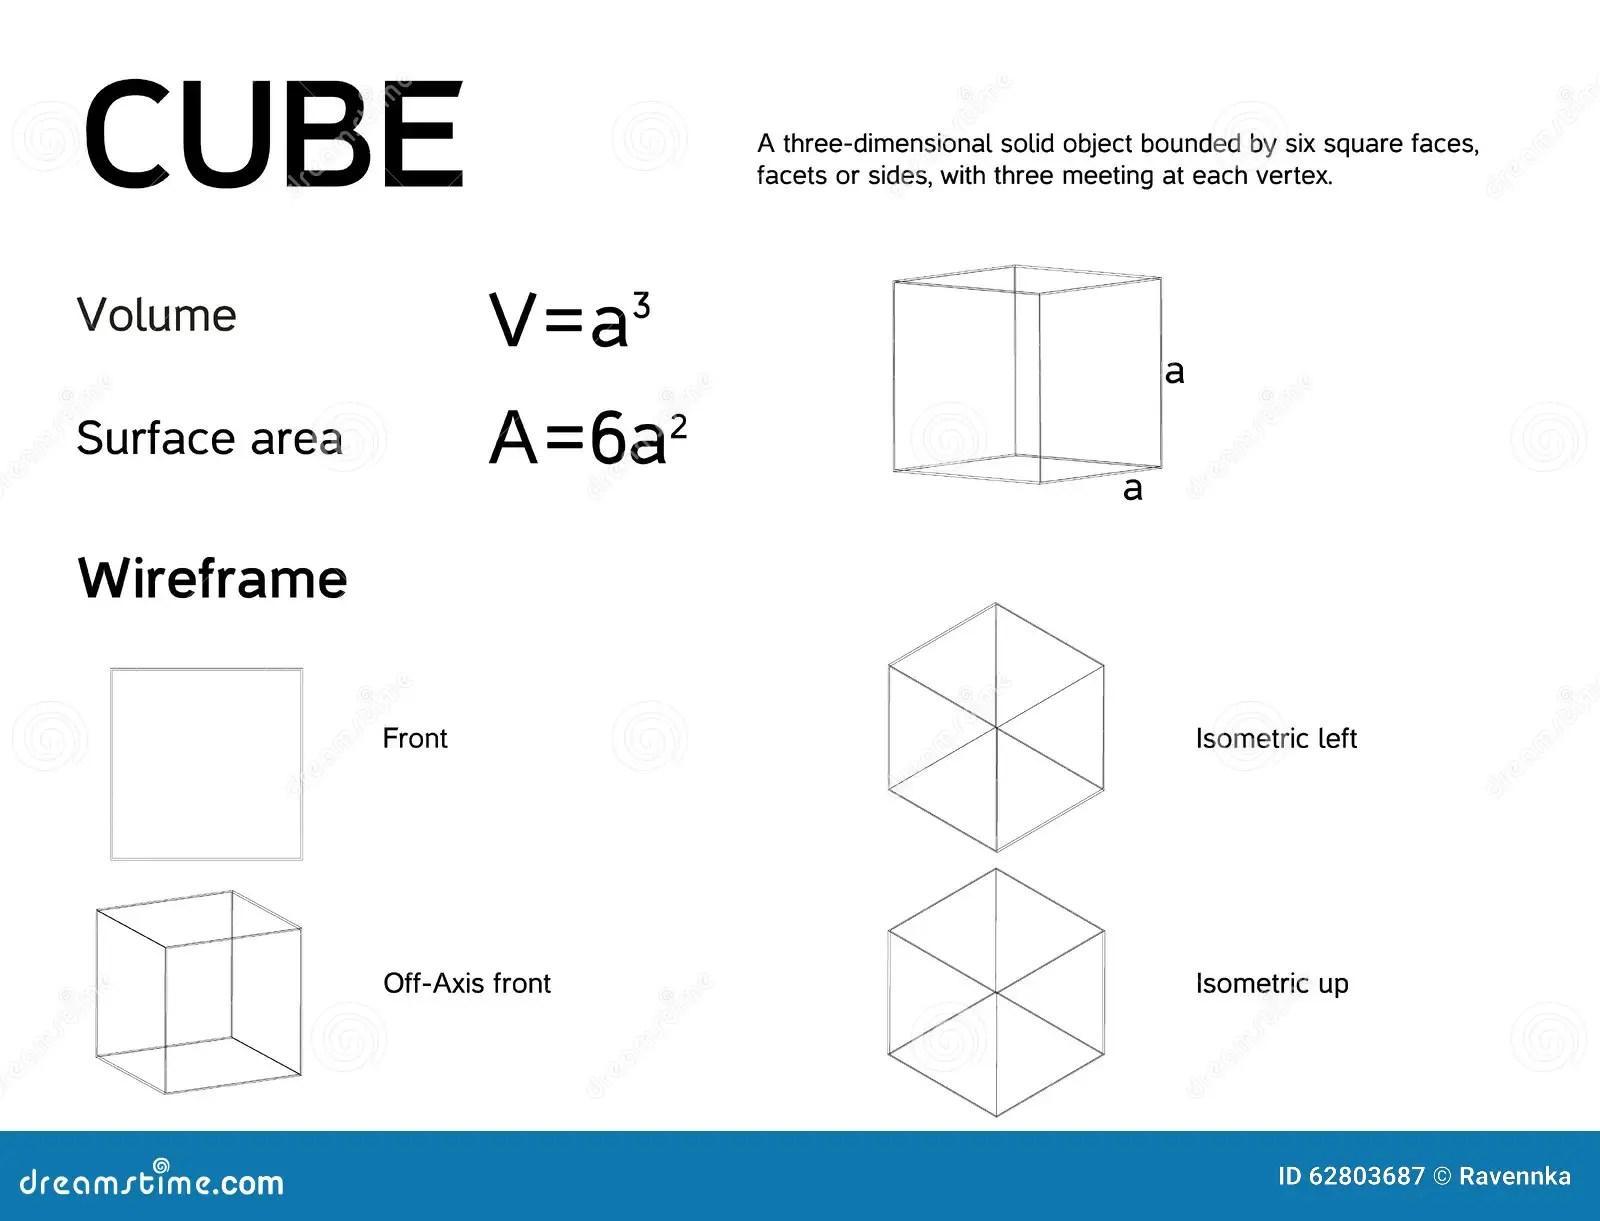 Forklarande Kub For Matematisk Affisch Med Formler For